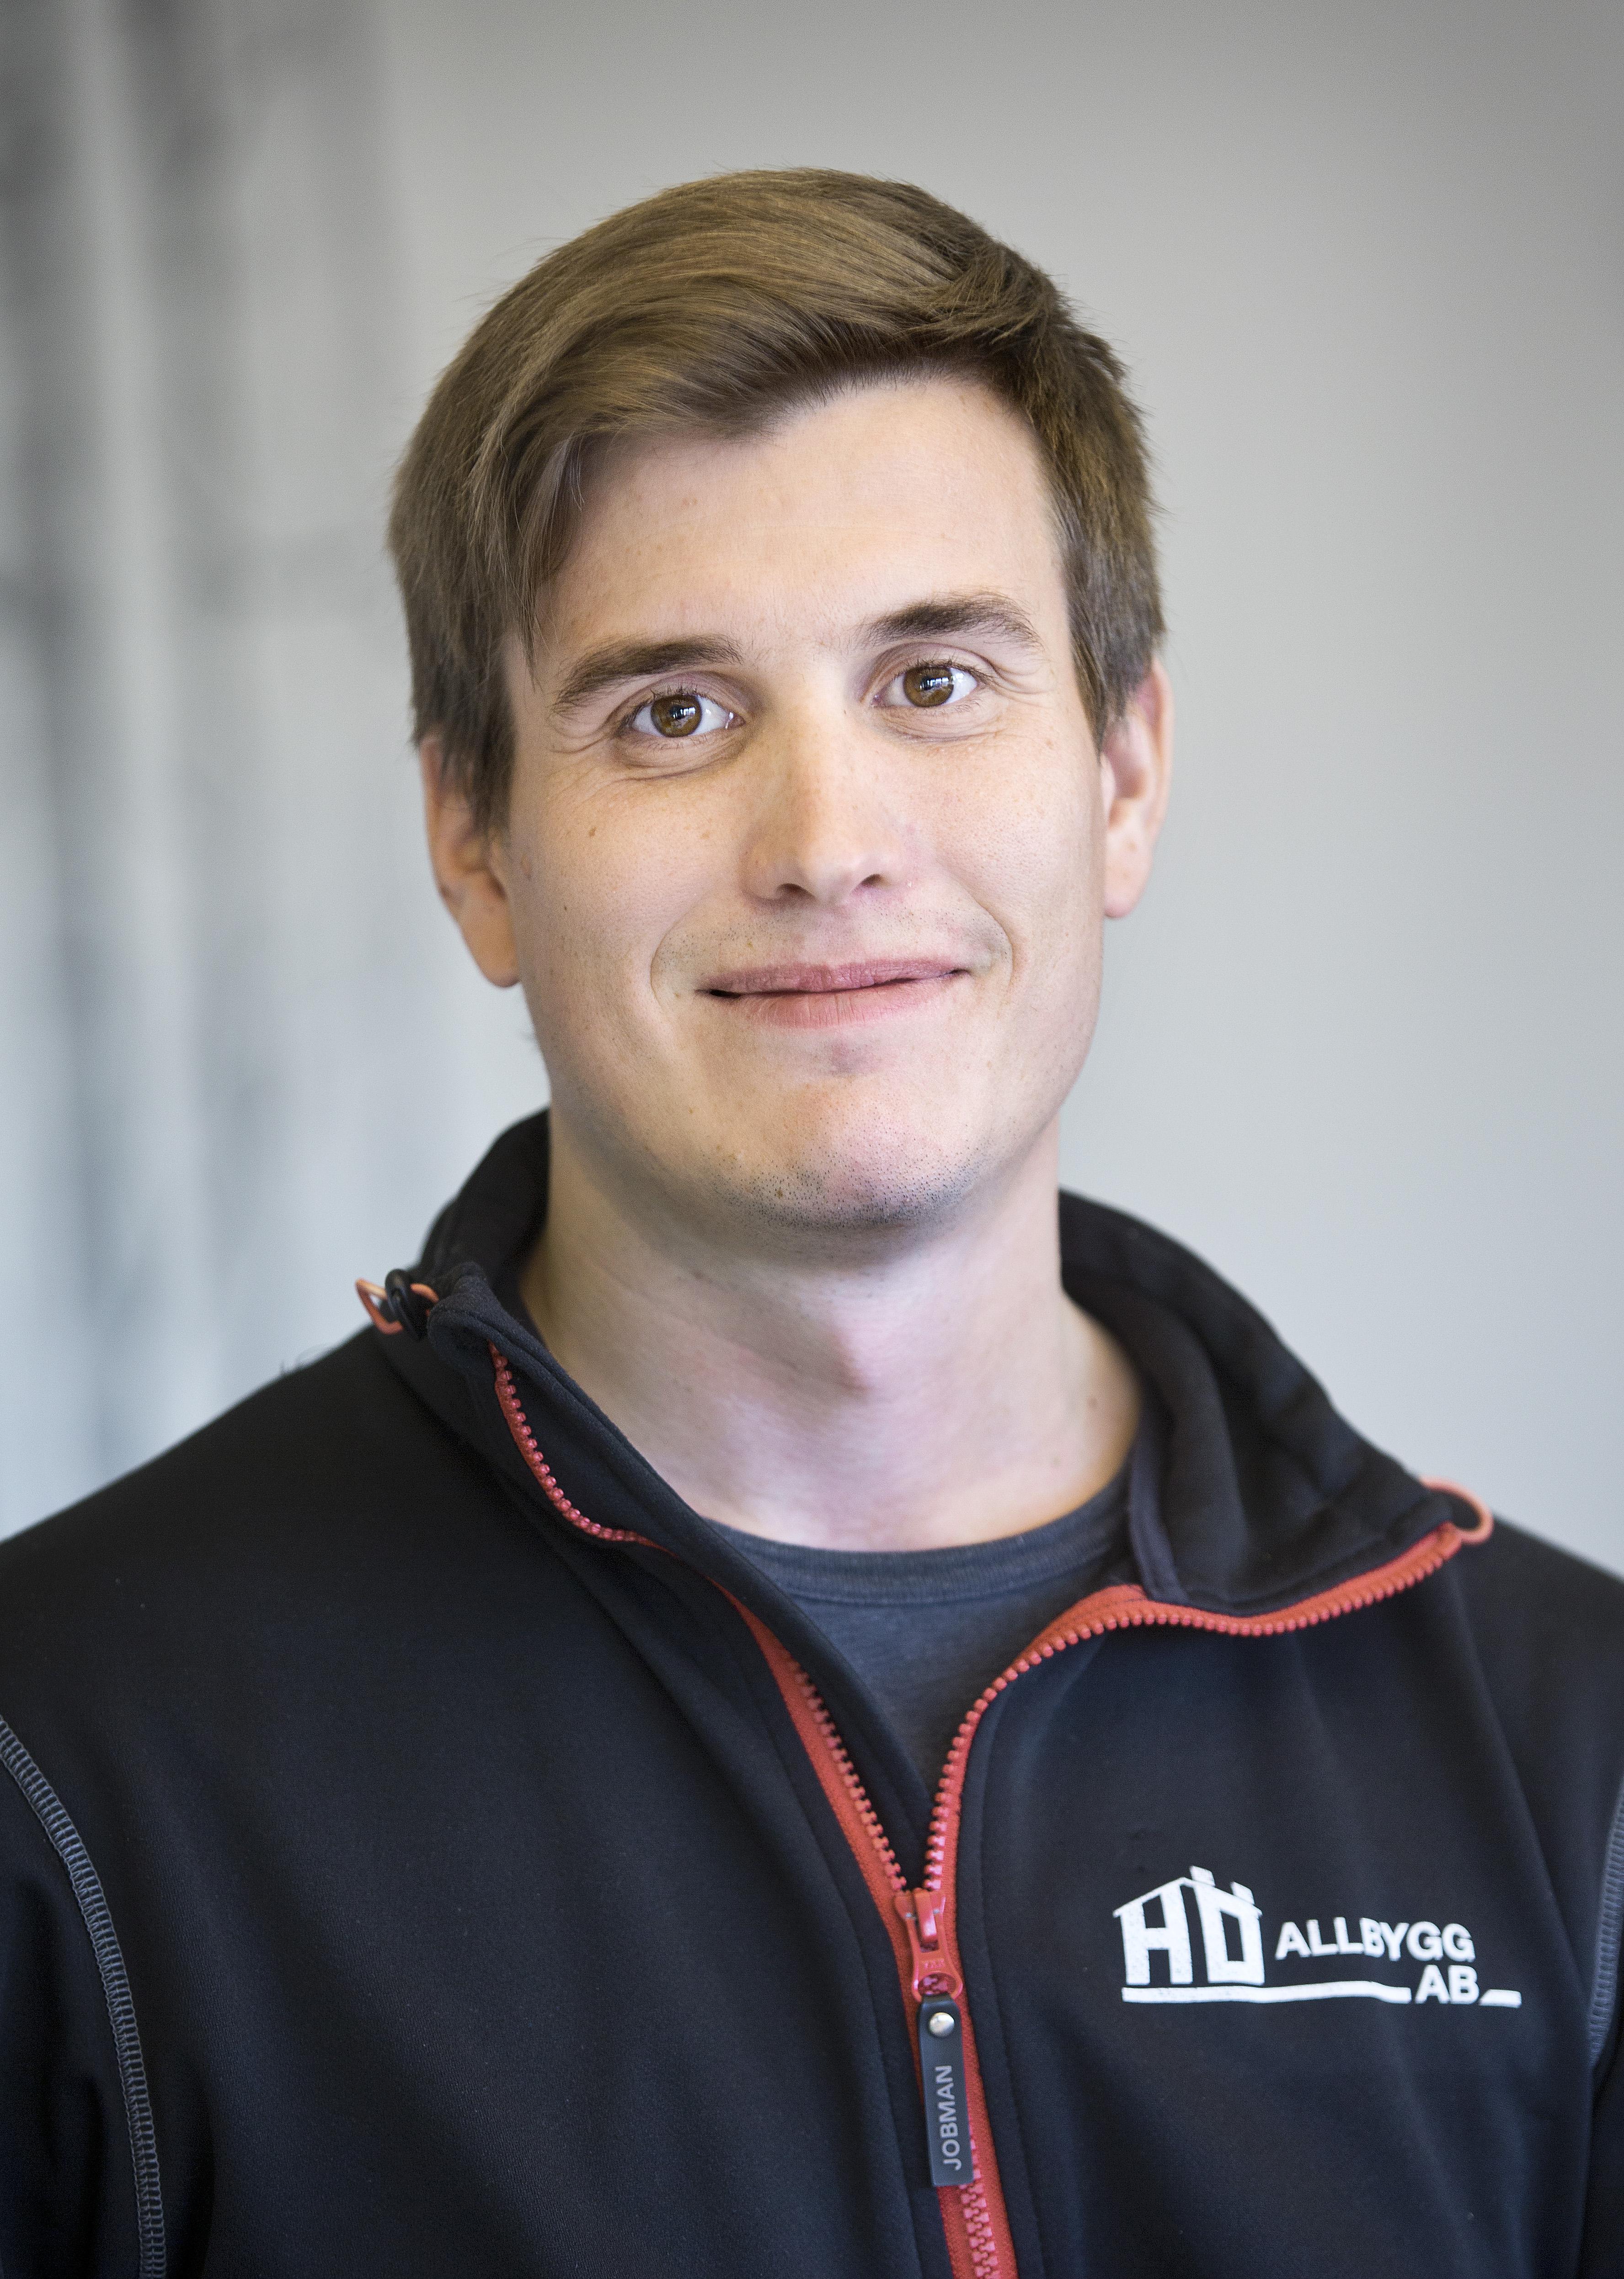 Johan Sandström